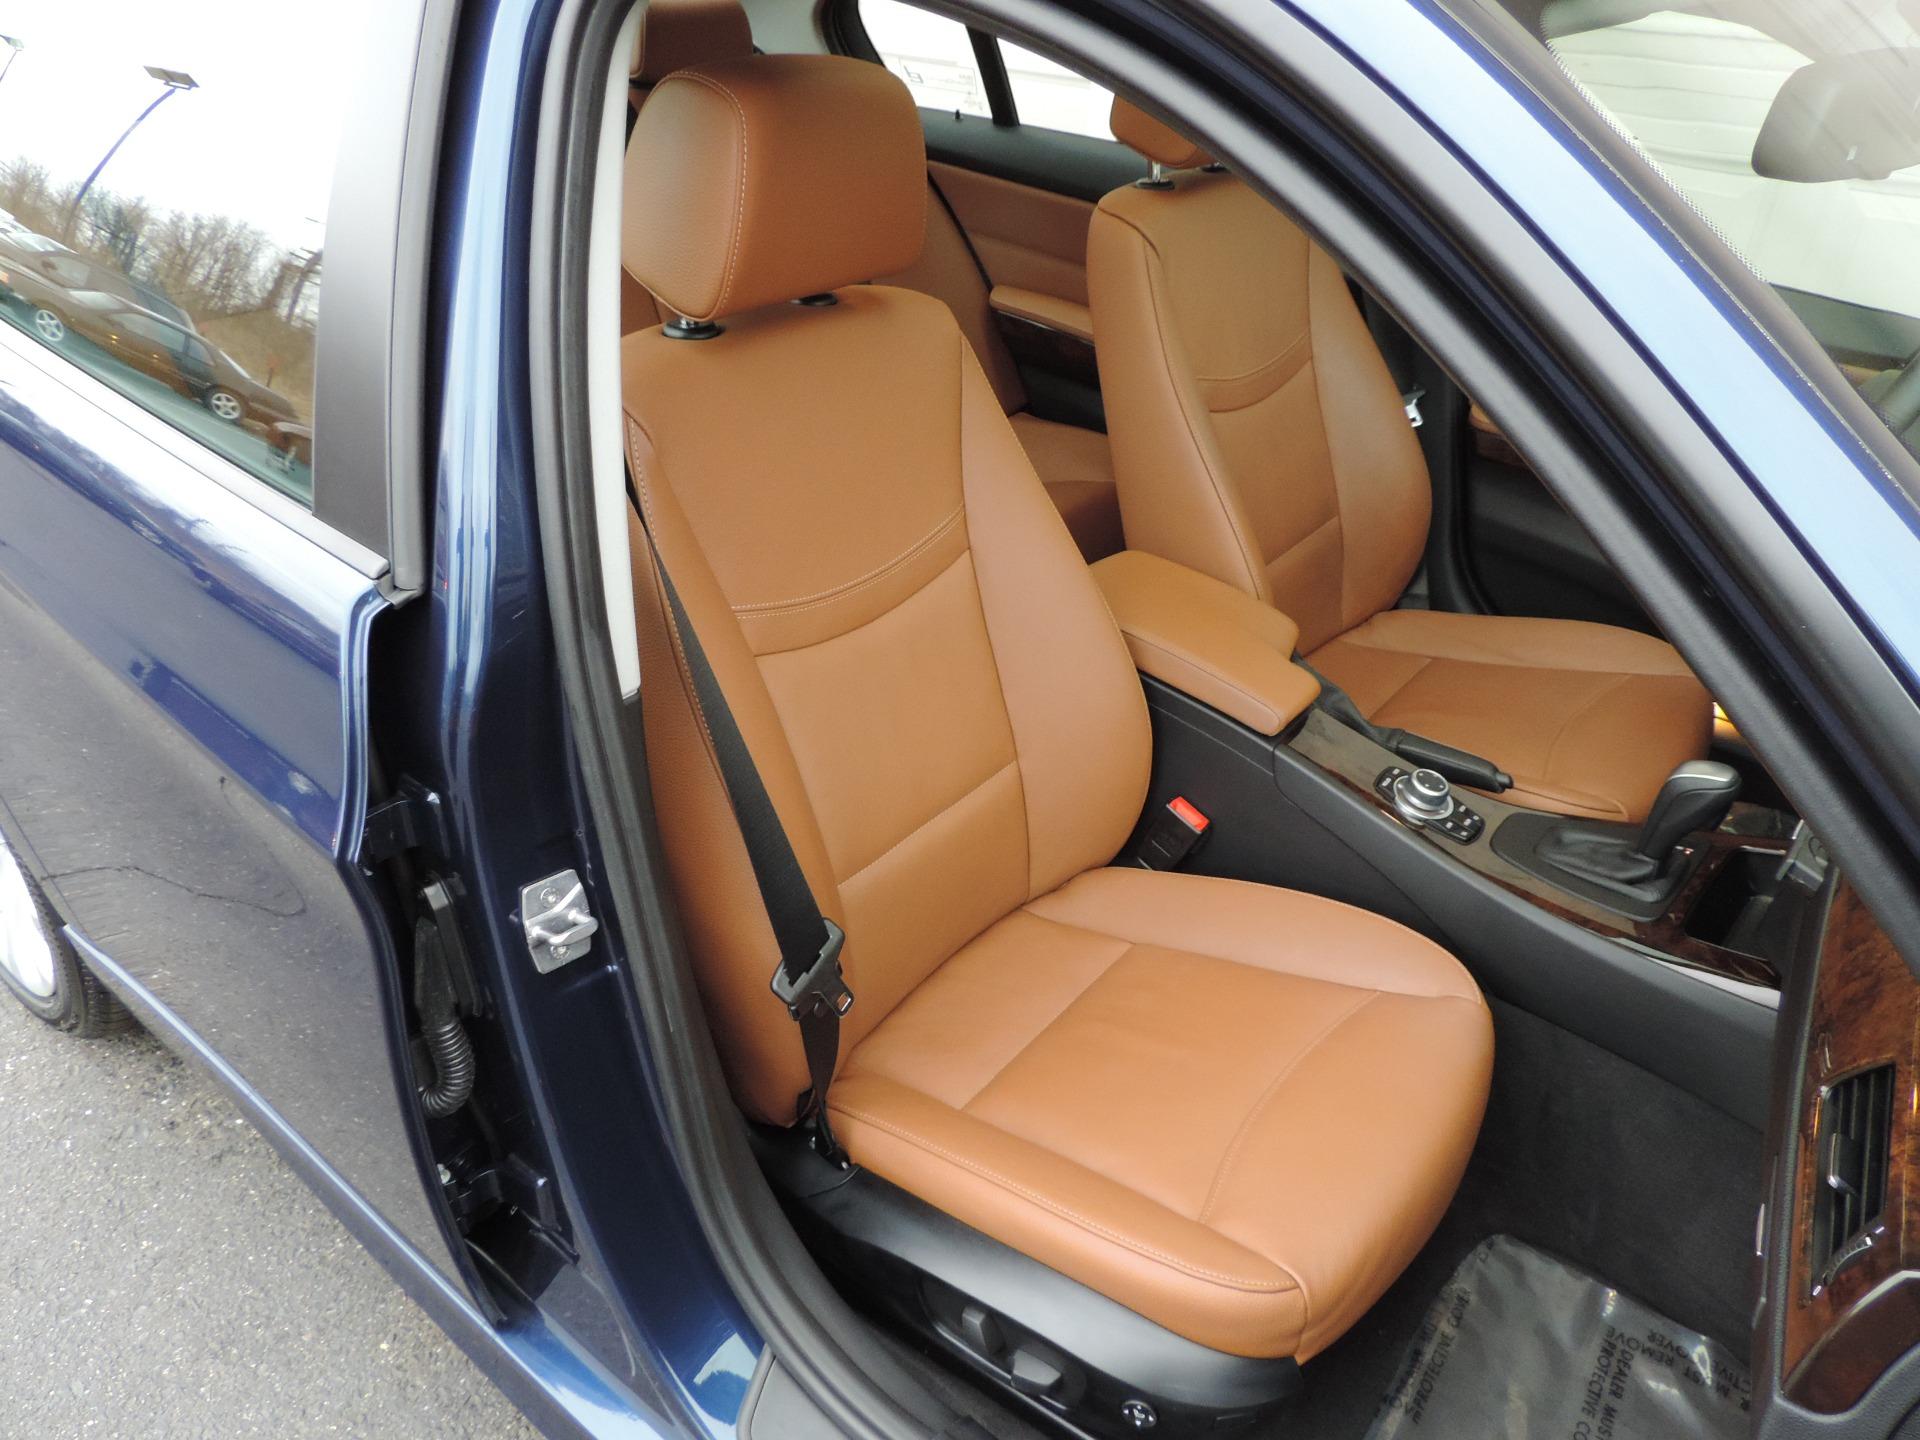 2011 Bmw 3 Series 328i Xdrive Stock   662245 For Sale Near Edgewater Park  Nj